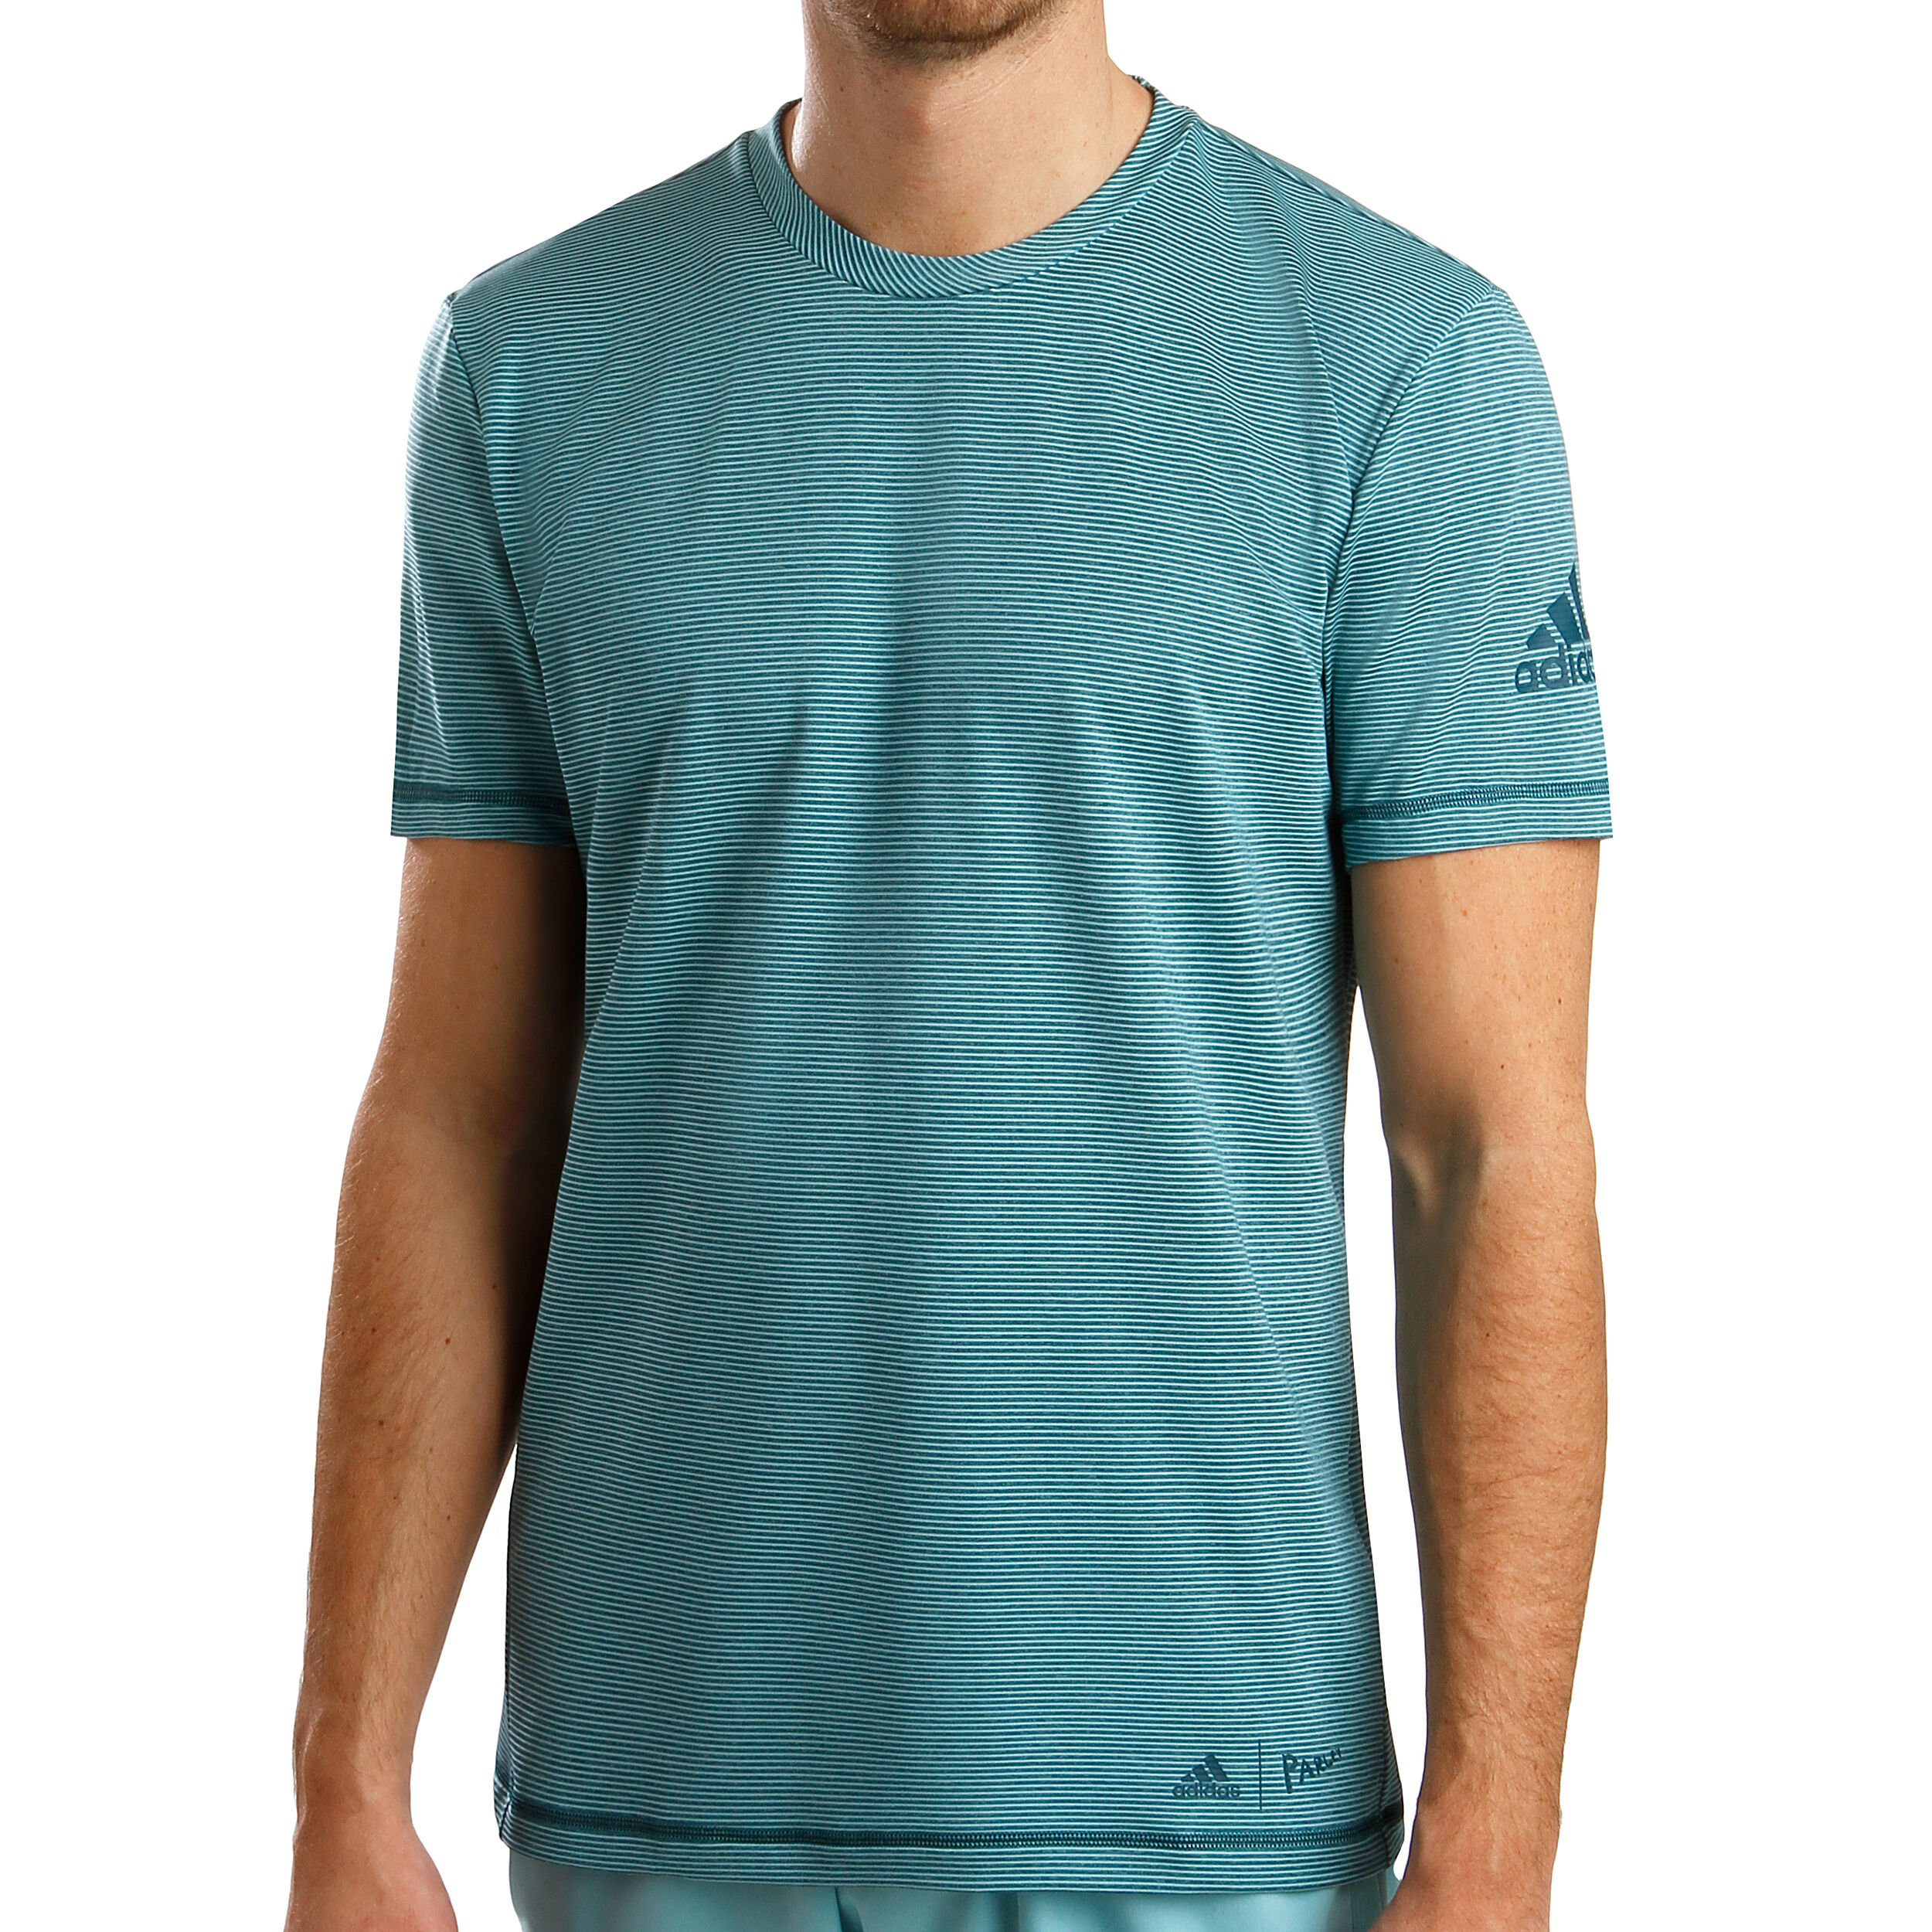 Striped Parley T Shirt Petrol Acheter Hommes MintBleu En Adidas 0mP8nNyvwO